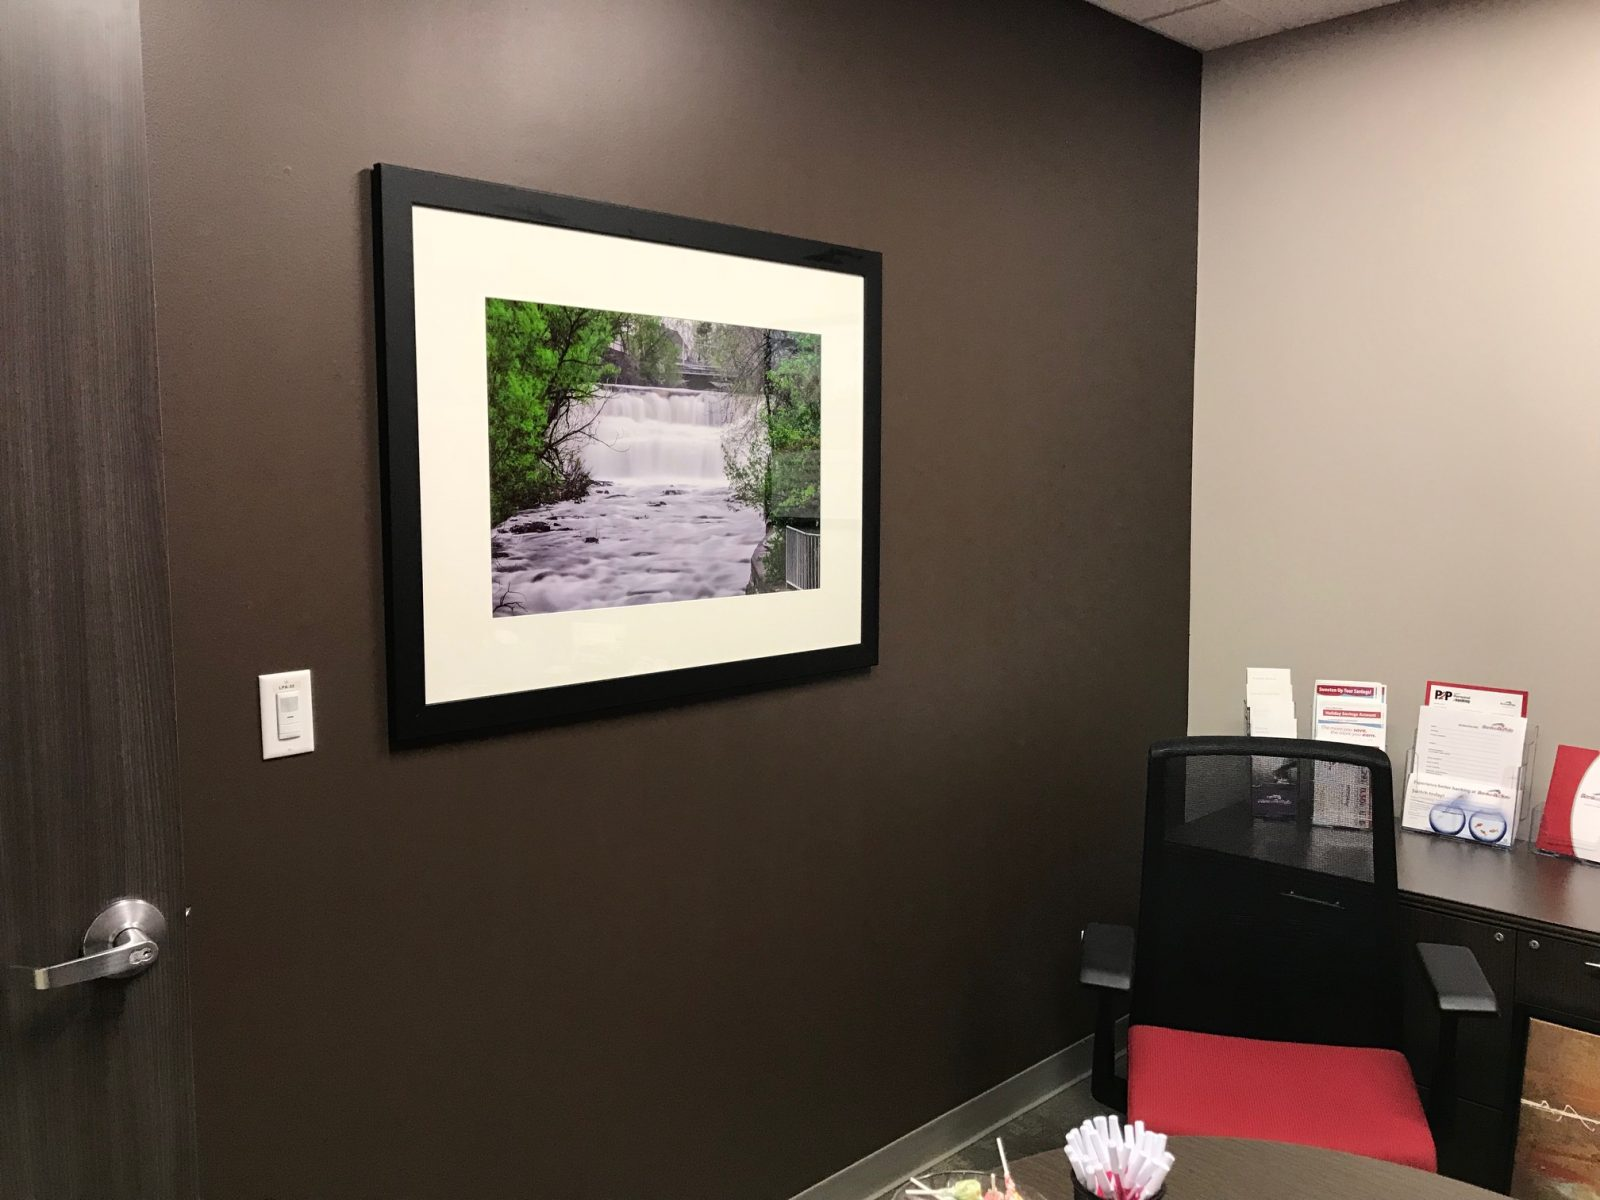 framed photograph above a desk